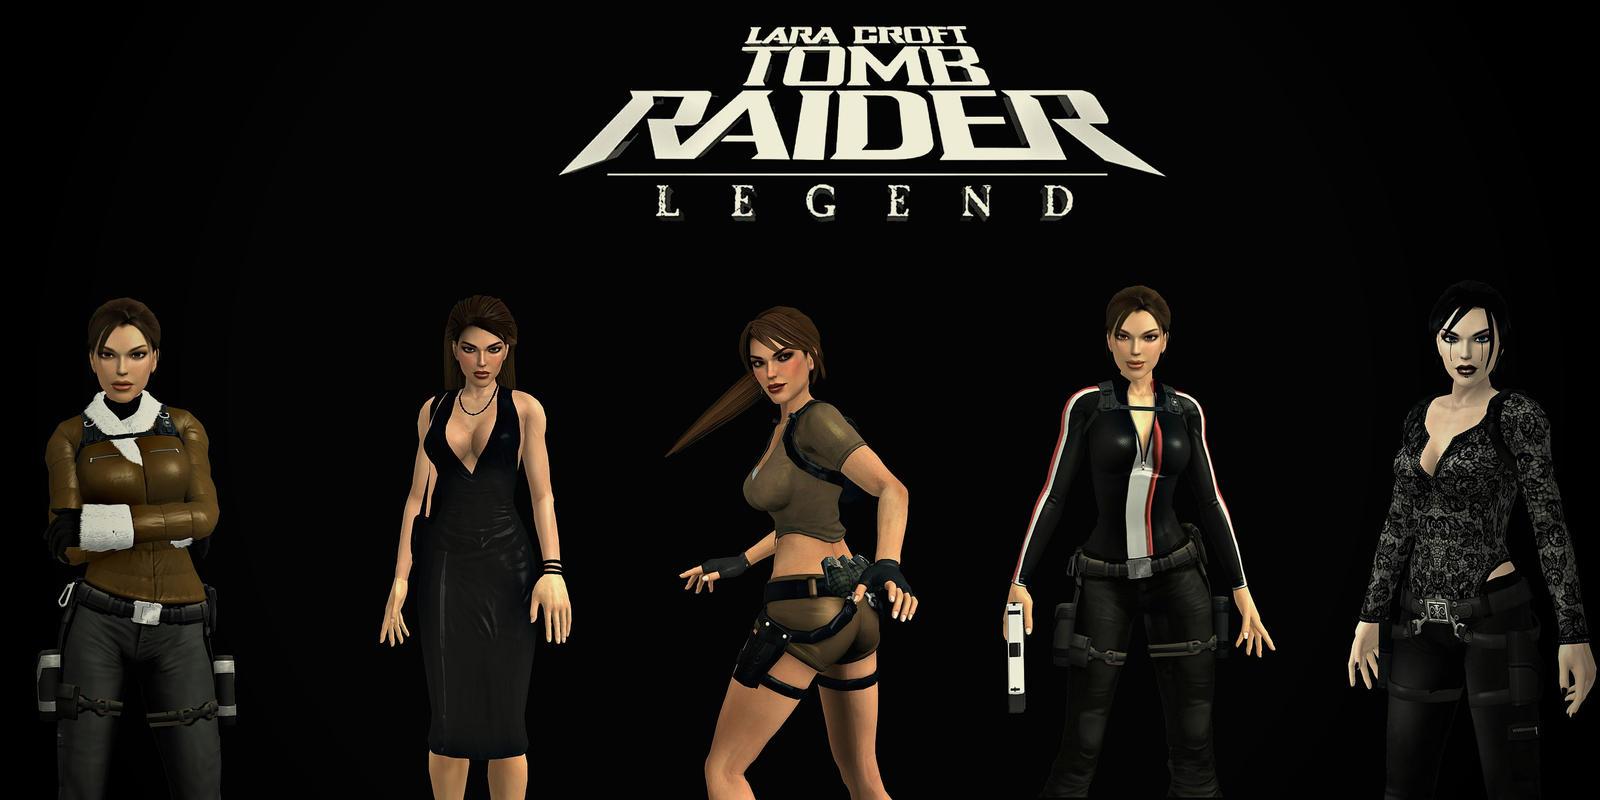 Tomb Raider Legend Outfits 3d Remake By Aya20809 On Deviantart